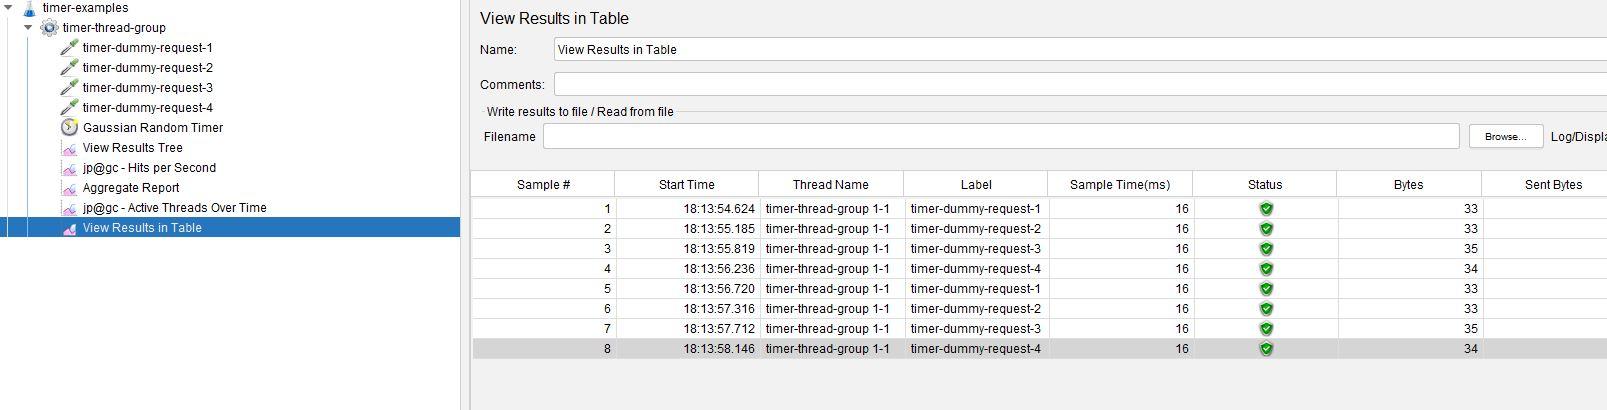 Gaussian Random Timer Results Table